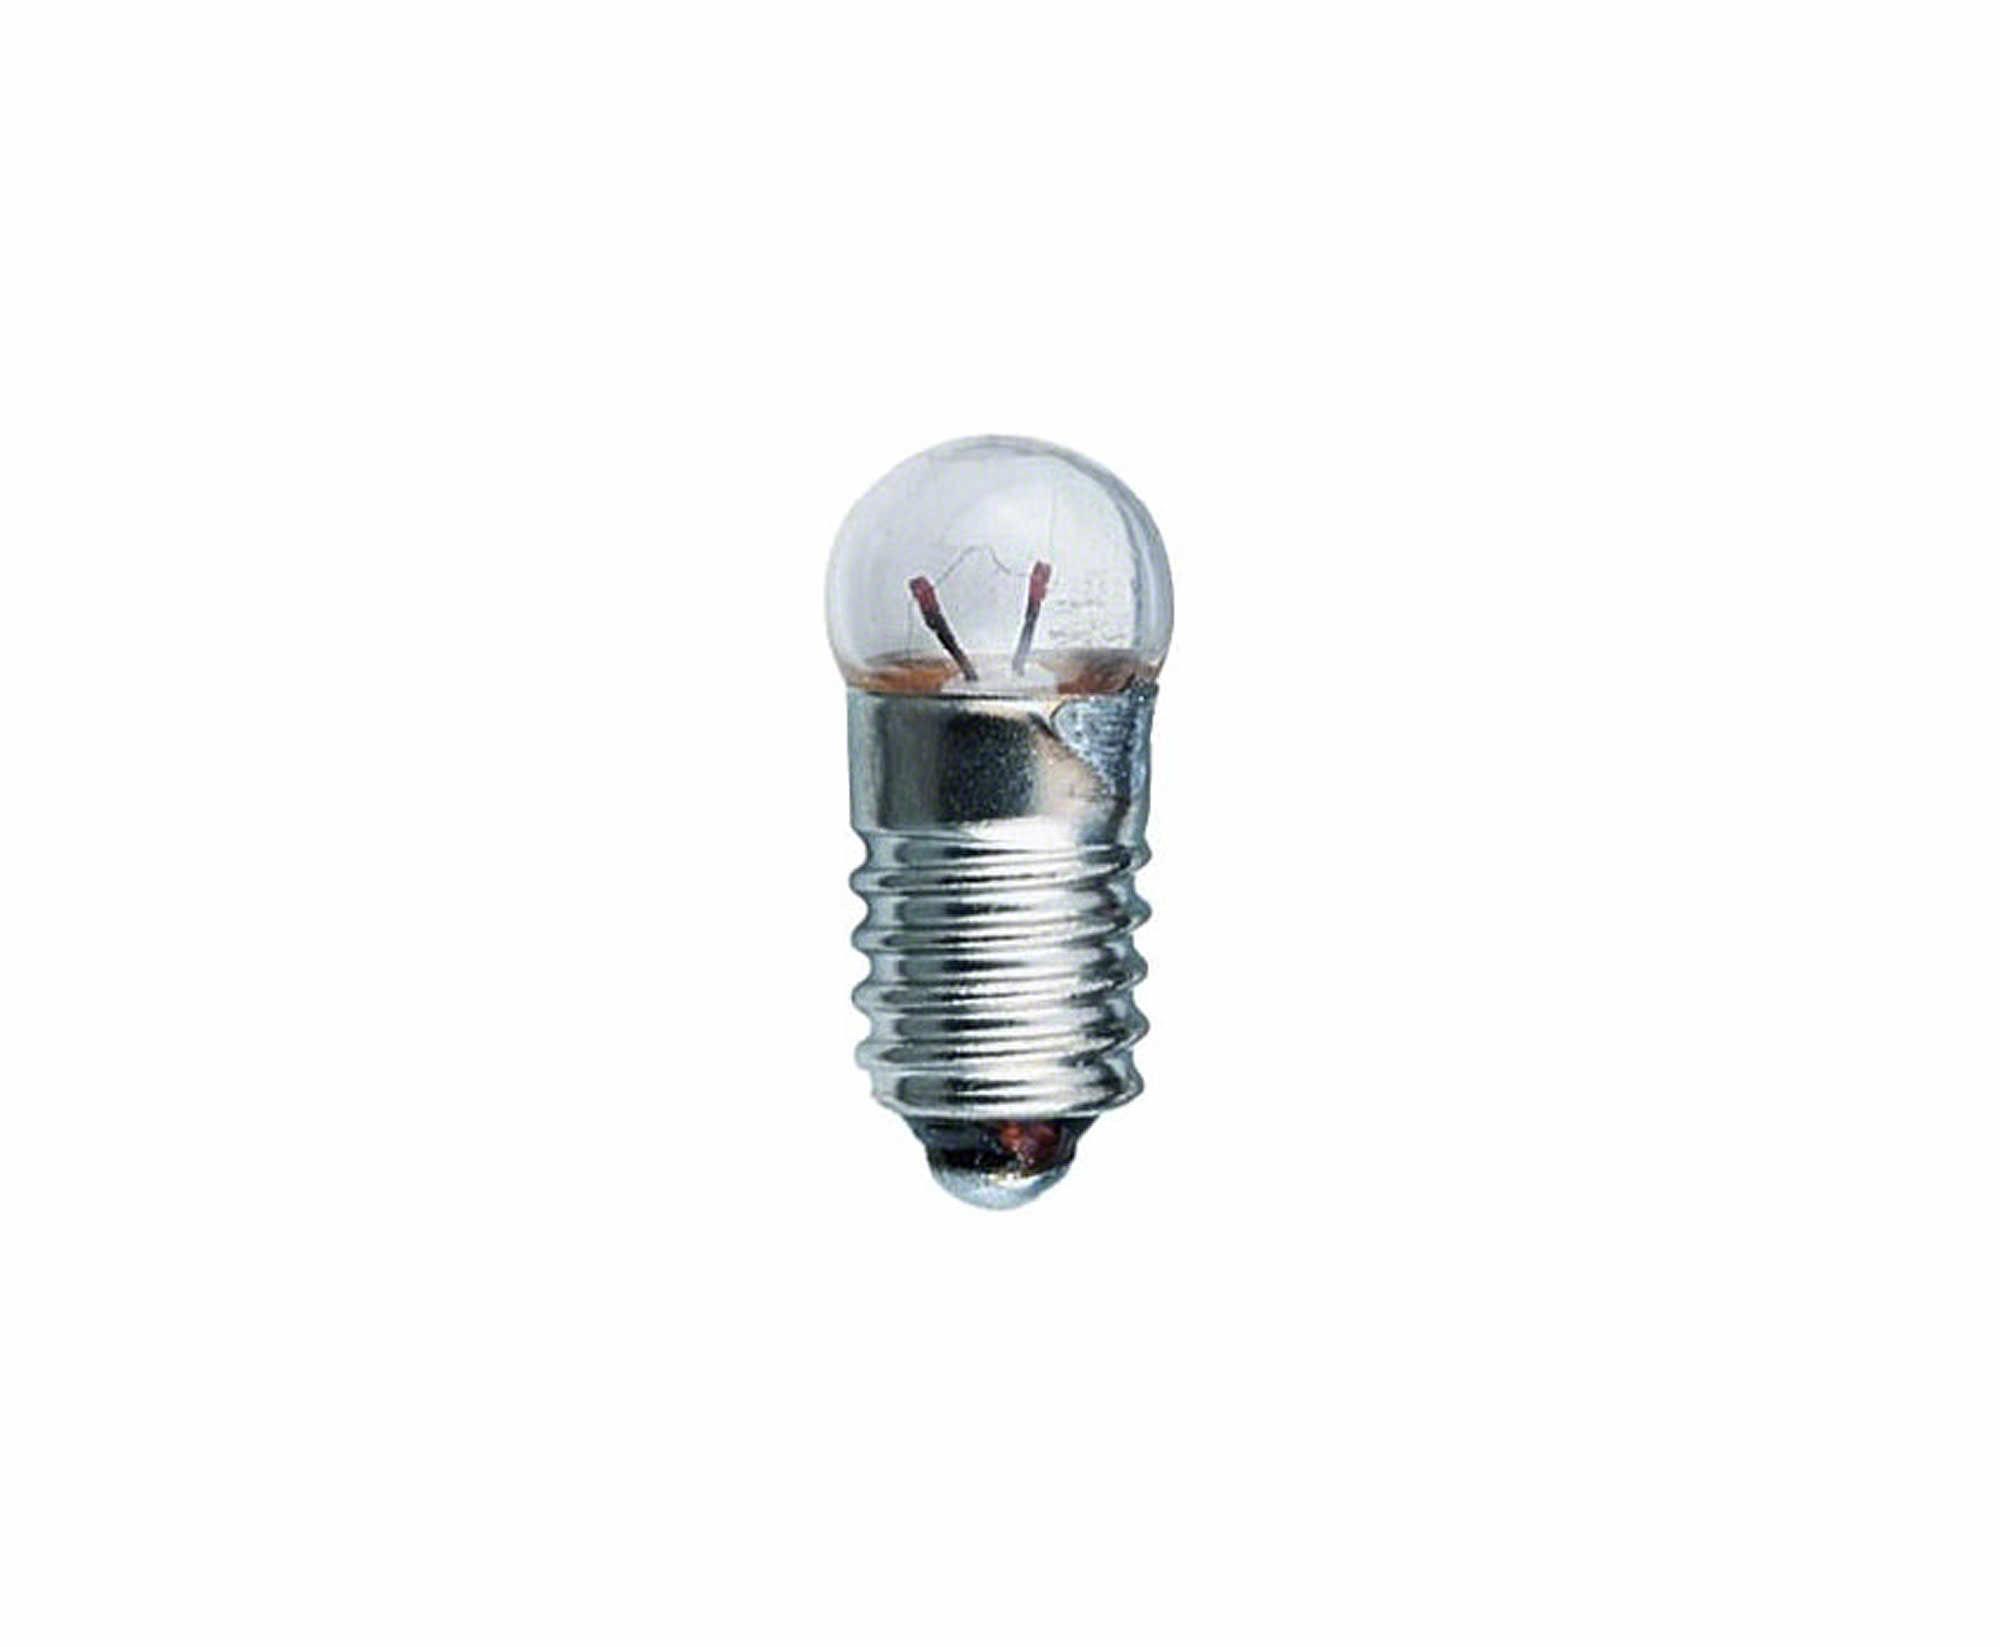 light bulb e5 5 socket 12v by erzgebirge palast